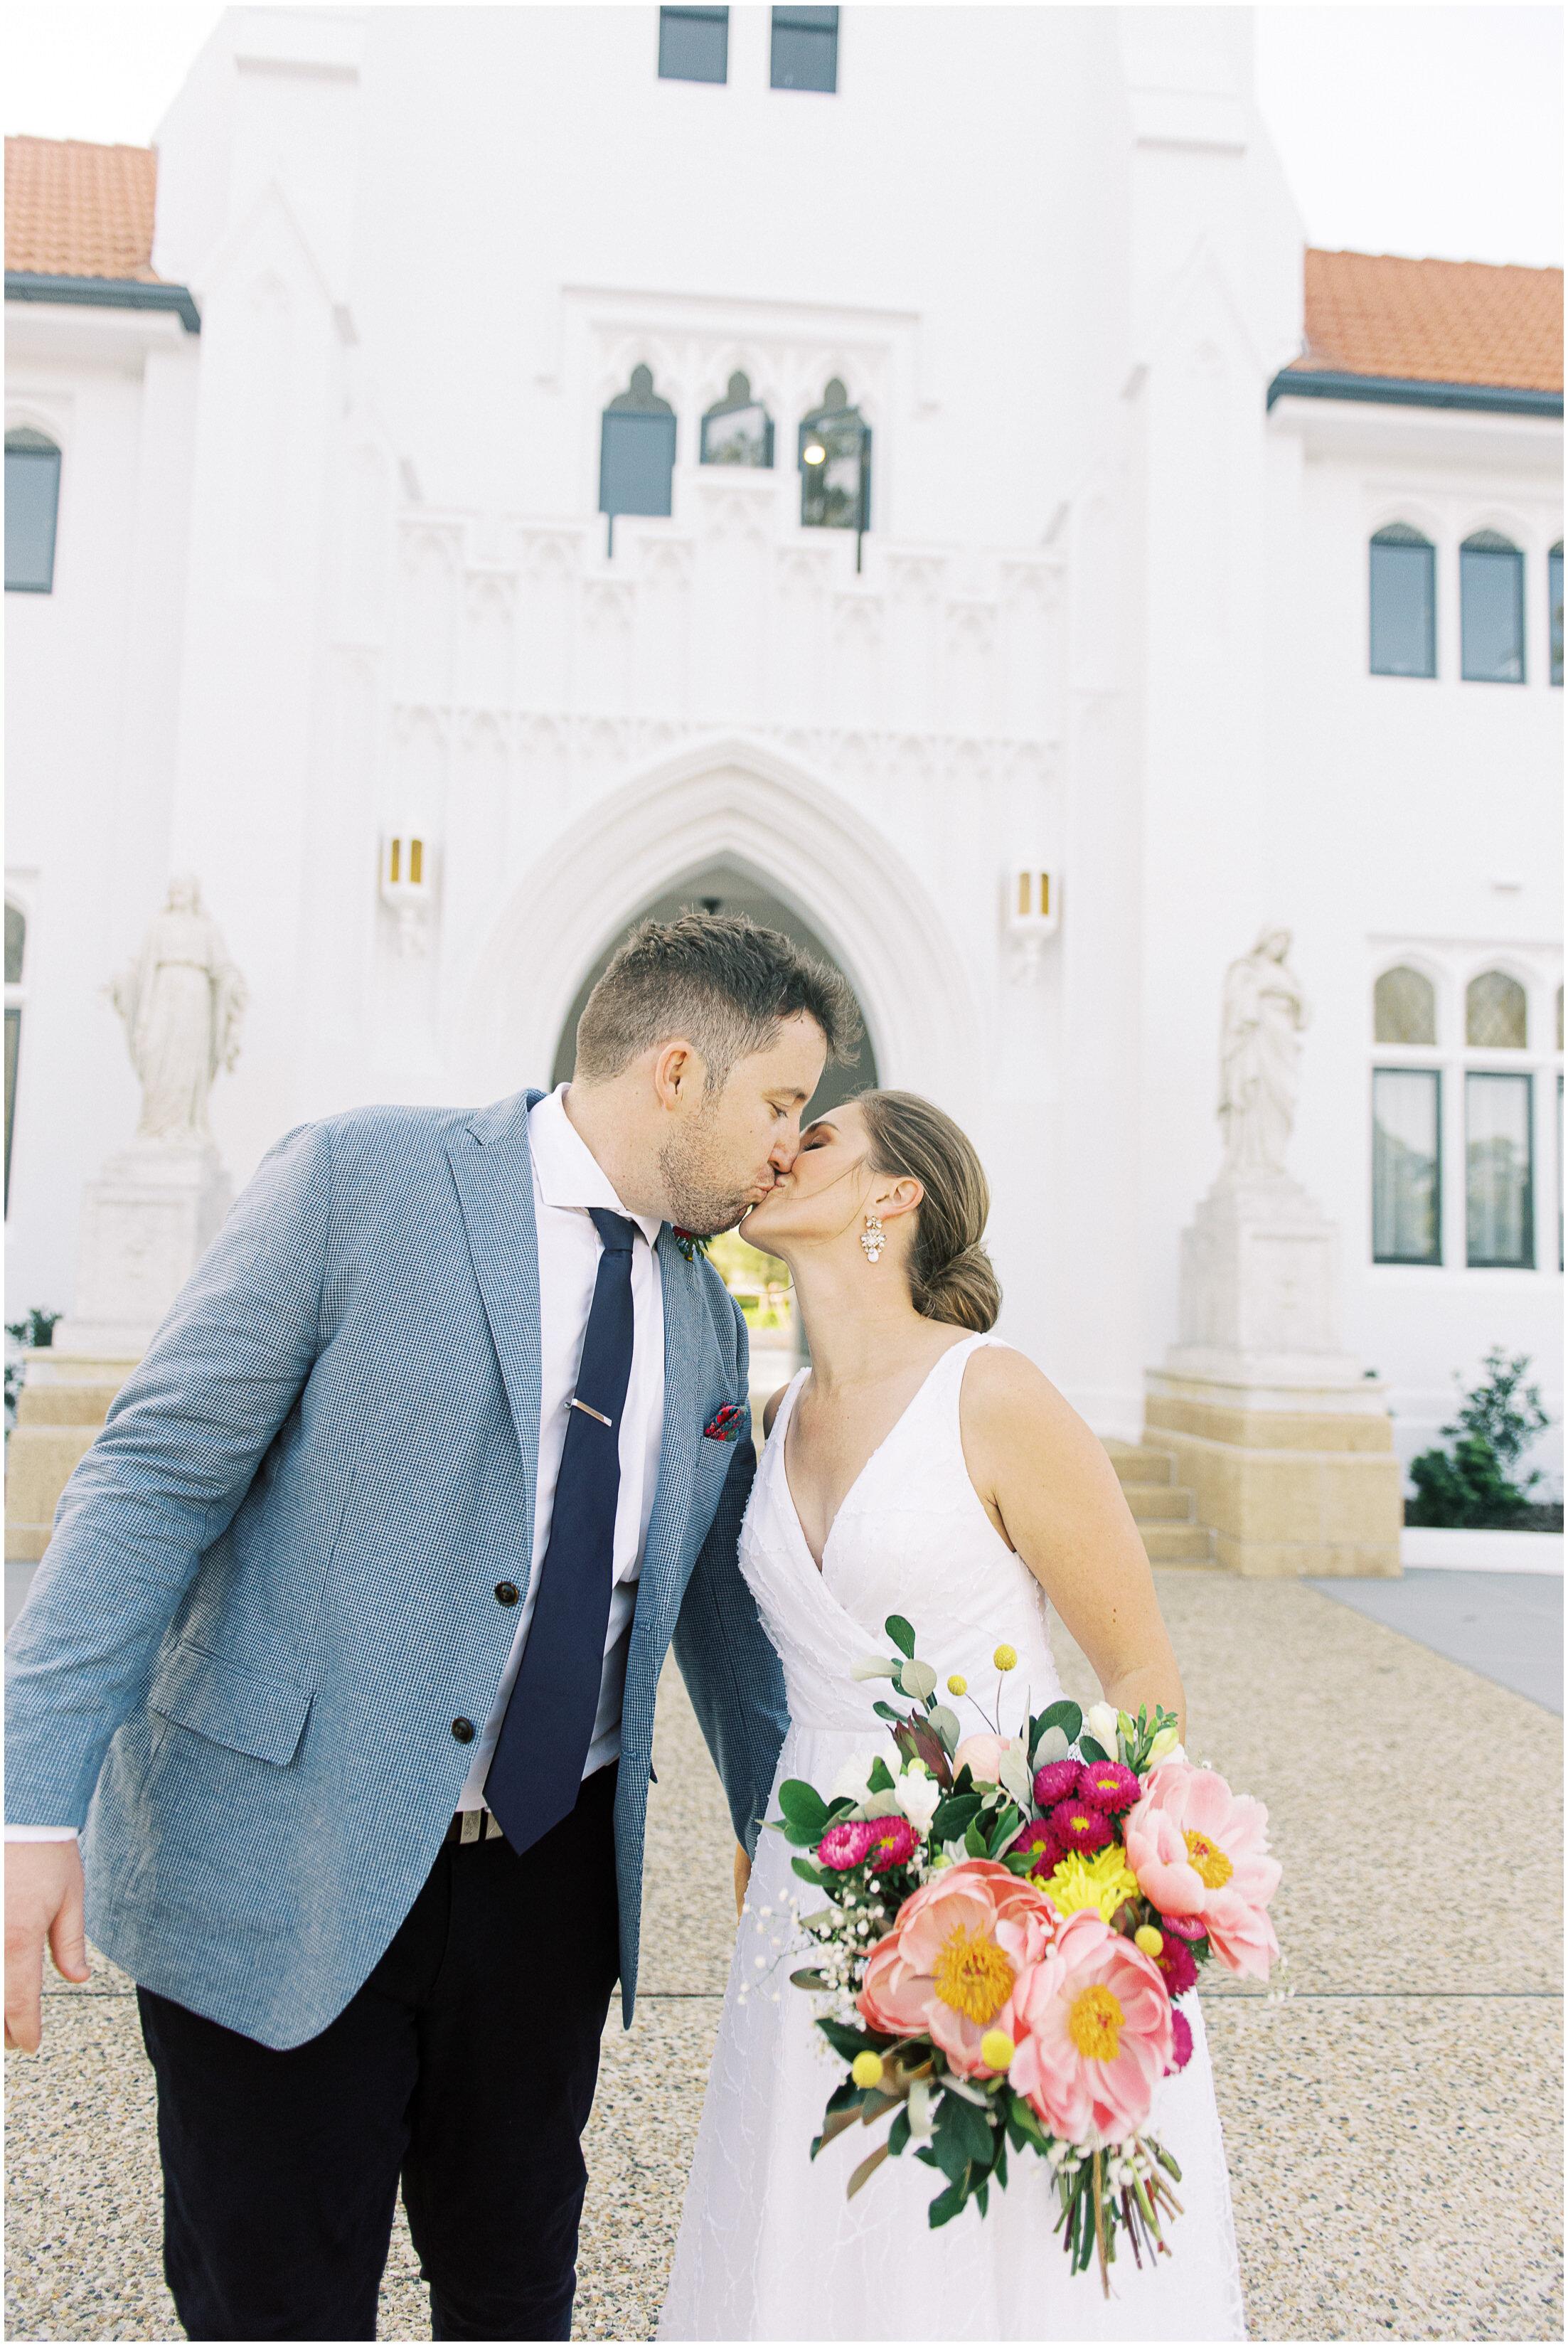 refinery-brisbane-wedding-photography-film-photographer-fine-art-27.jpg